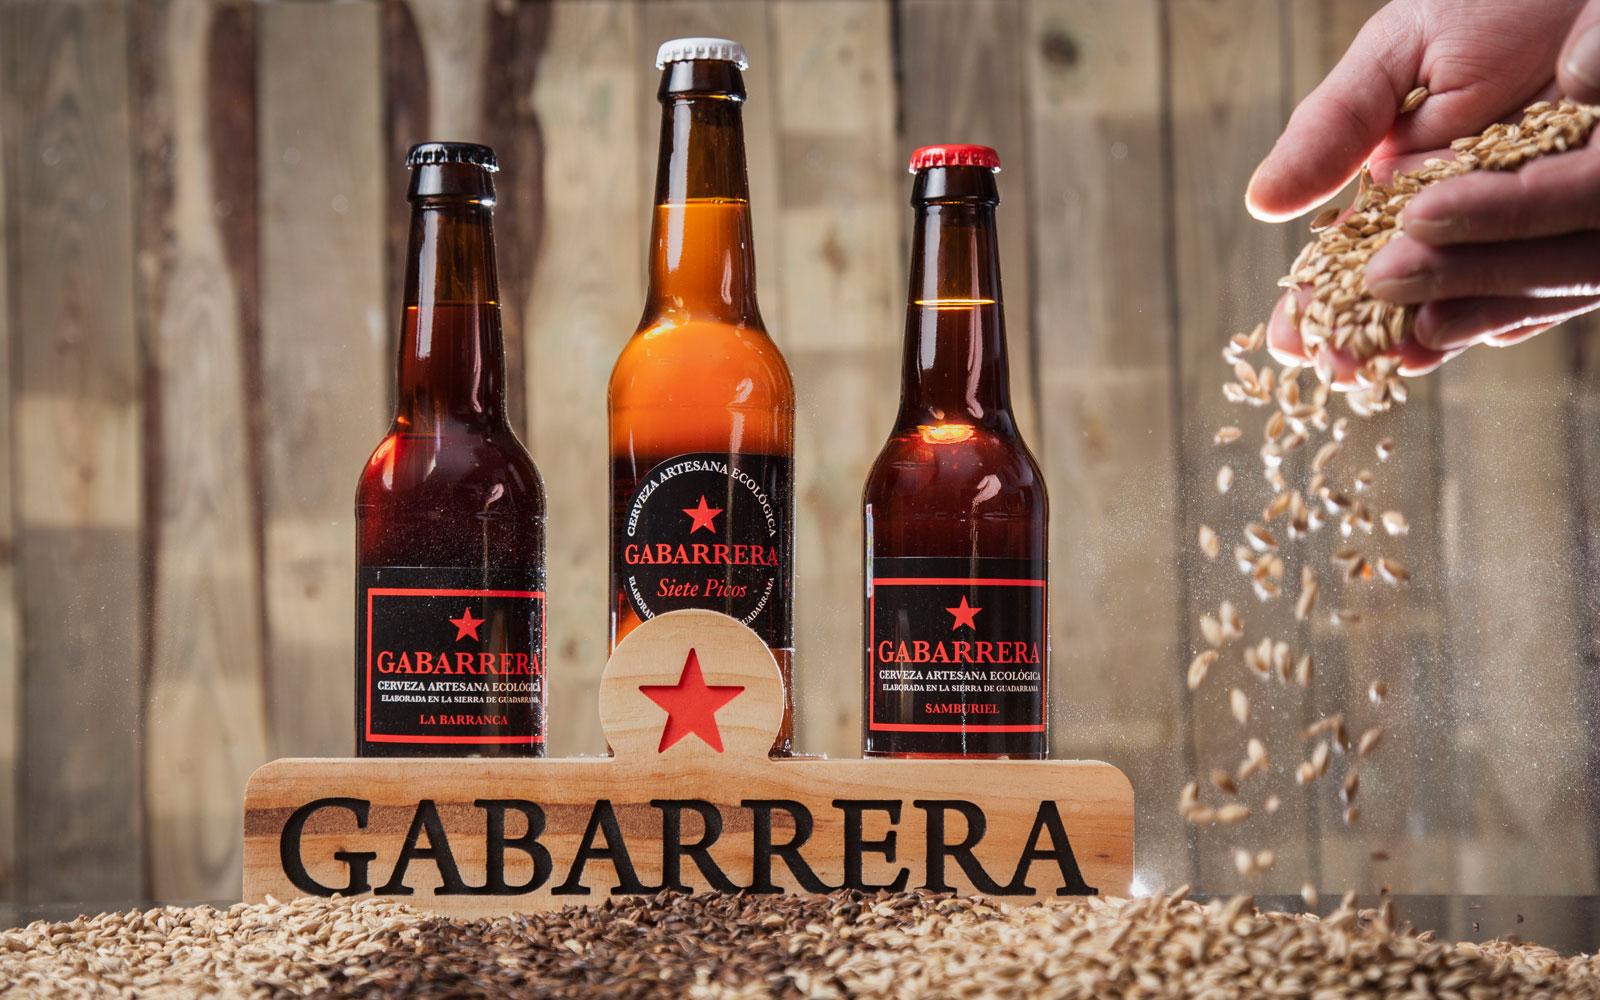 Cerveza ecológica artesana madrid Gabarrera el mundo ecológico